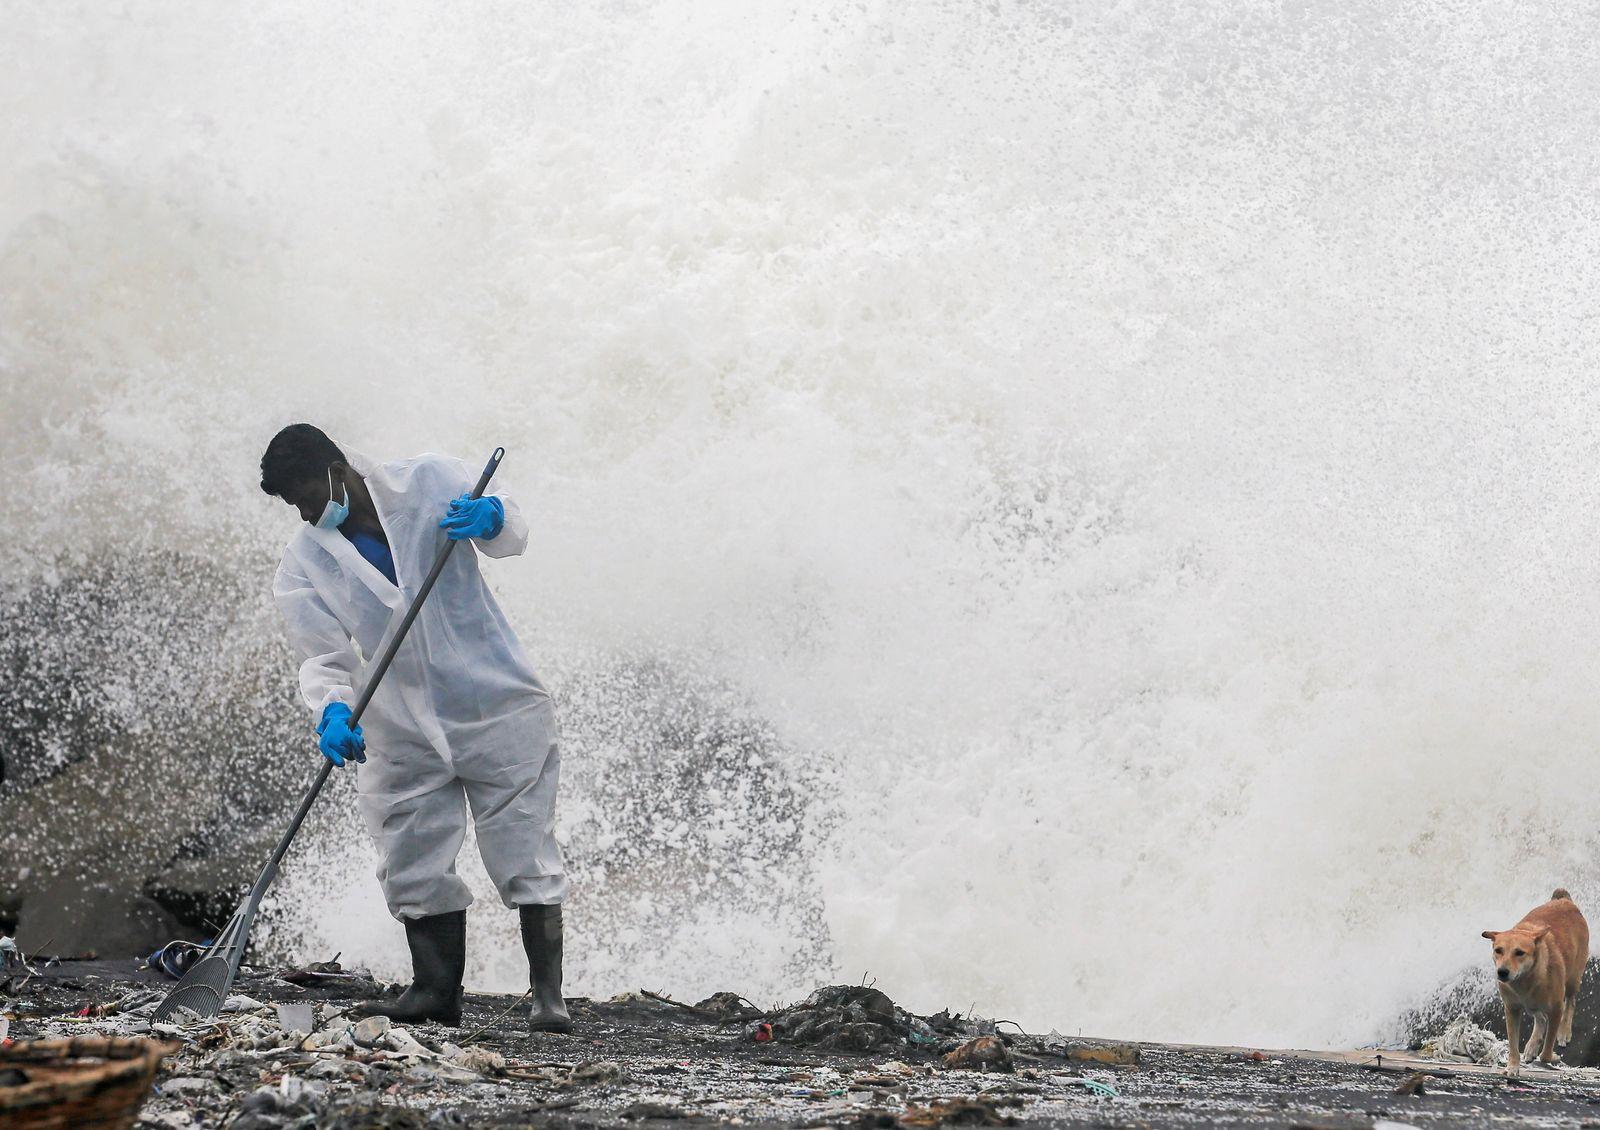 Sri Lankan navy members remove debris washed to beach from MV X-Press Pearl, in Ja-Ela